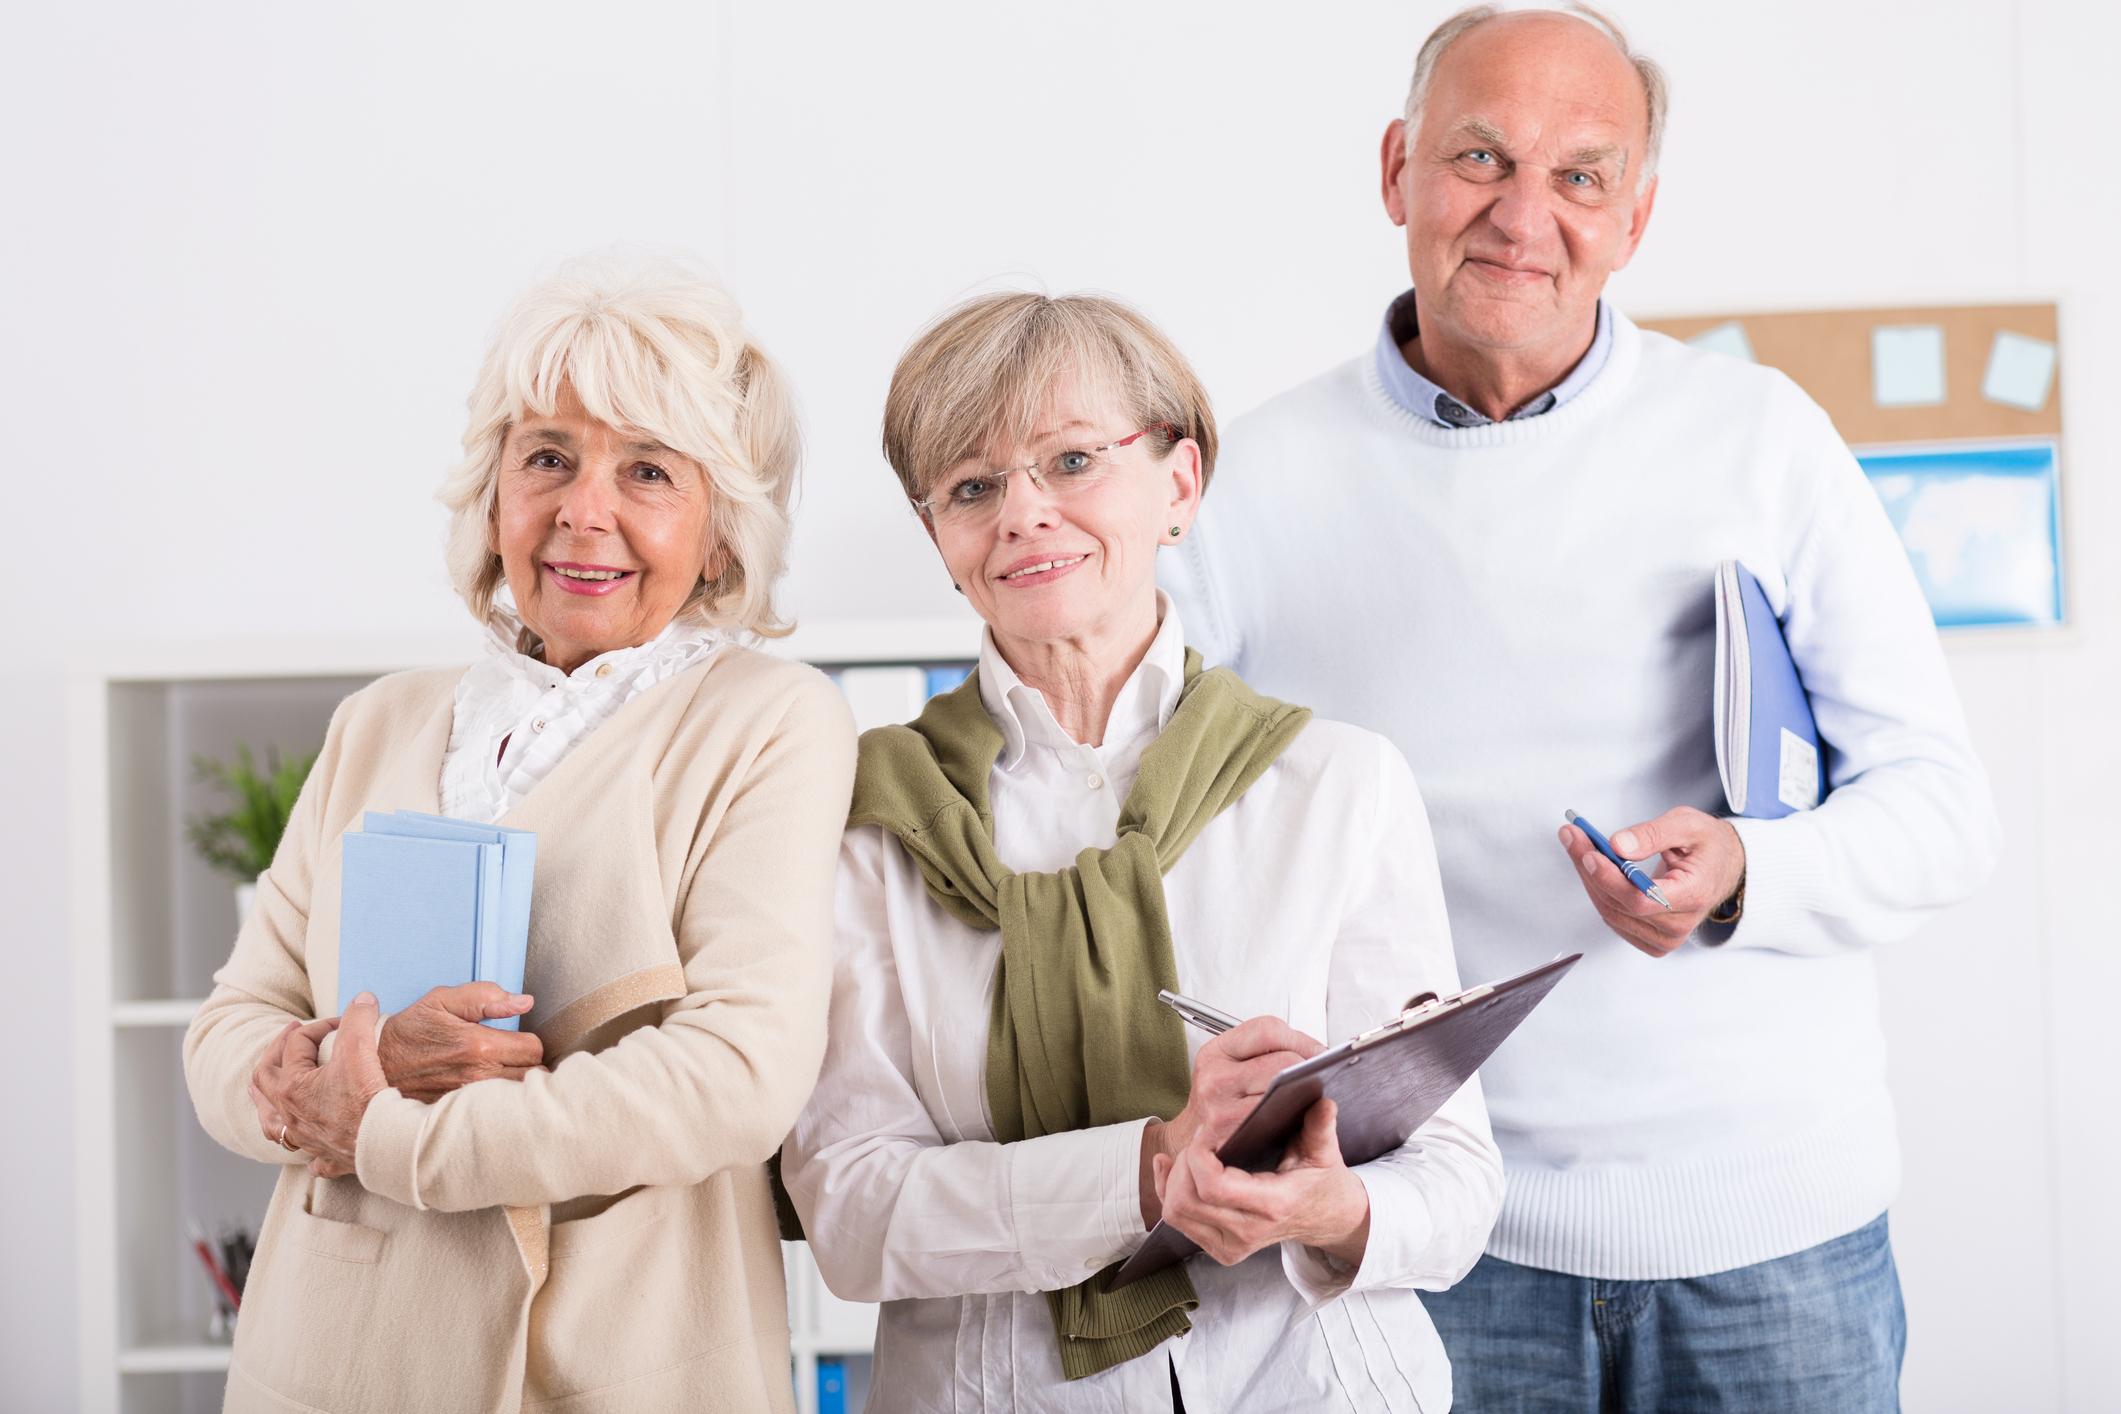 Three seniors holding pens and notebooks.